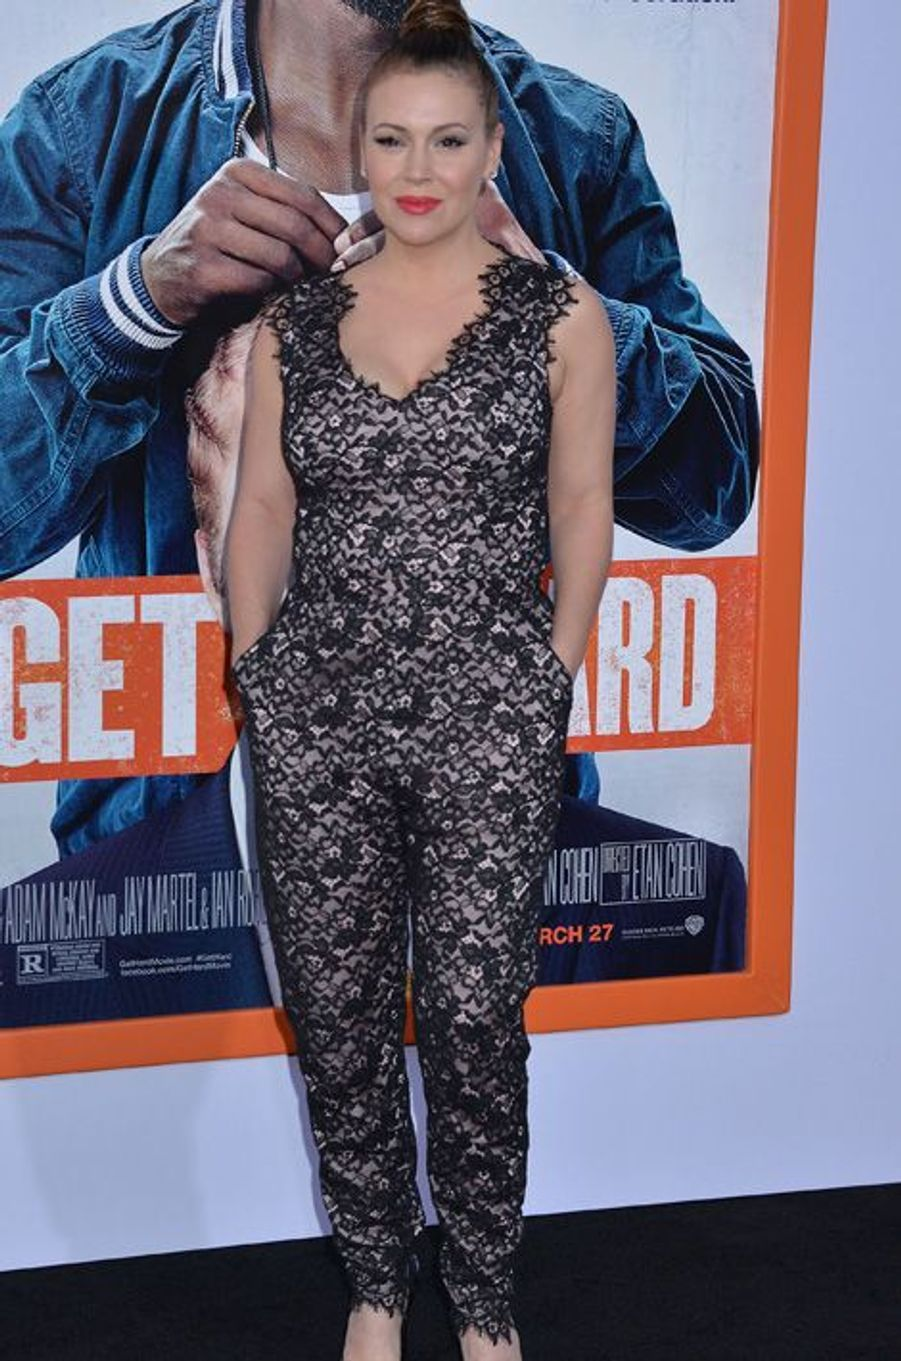 Alyssa Milano (Phoebe Halliwell)